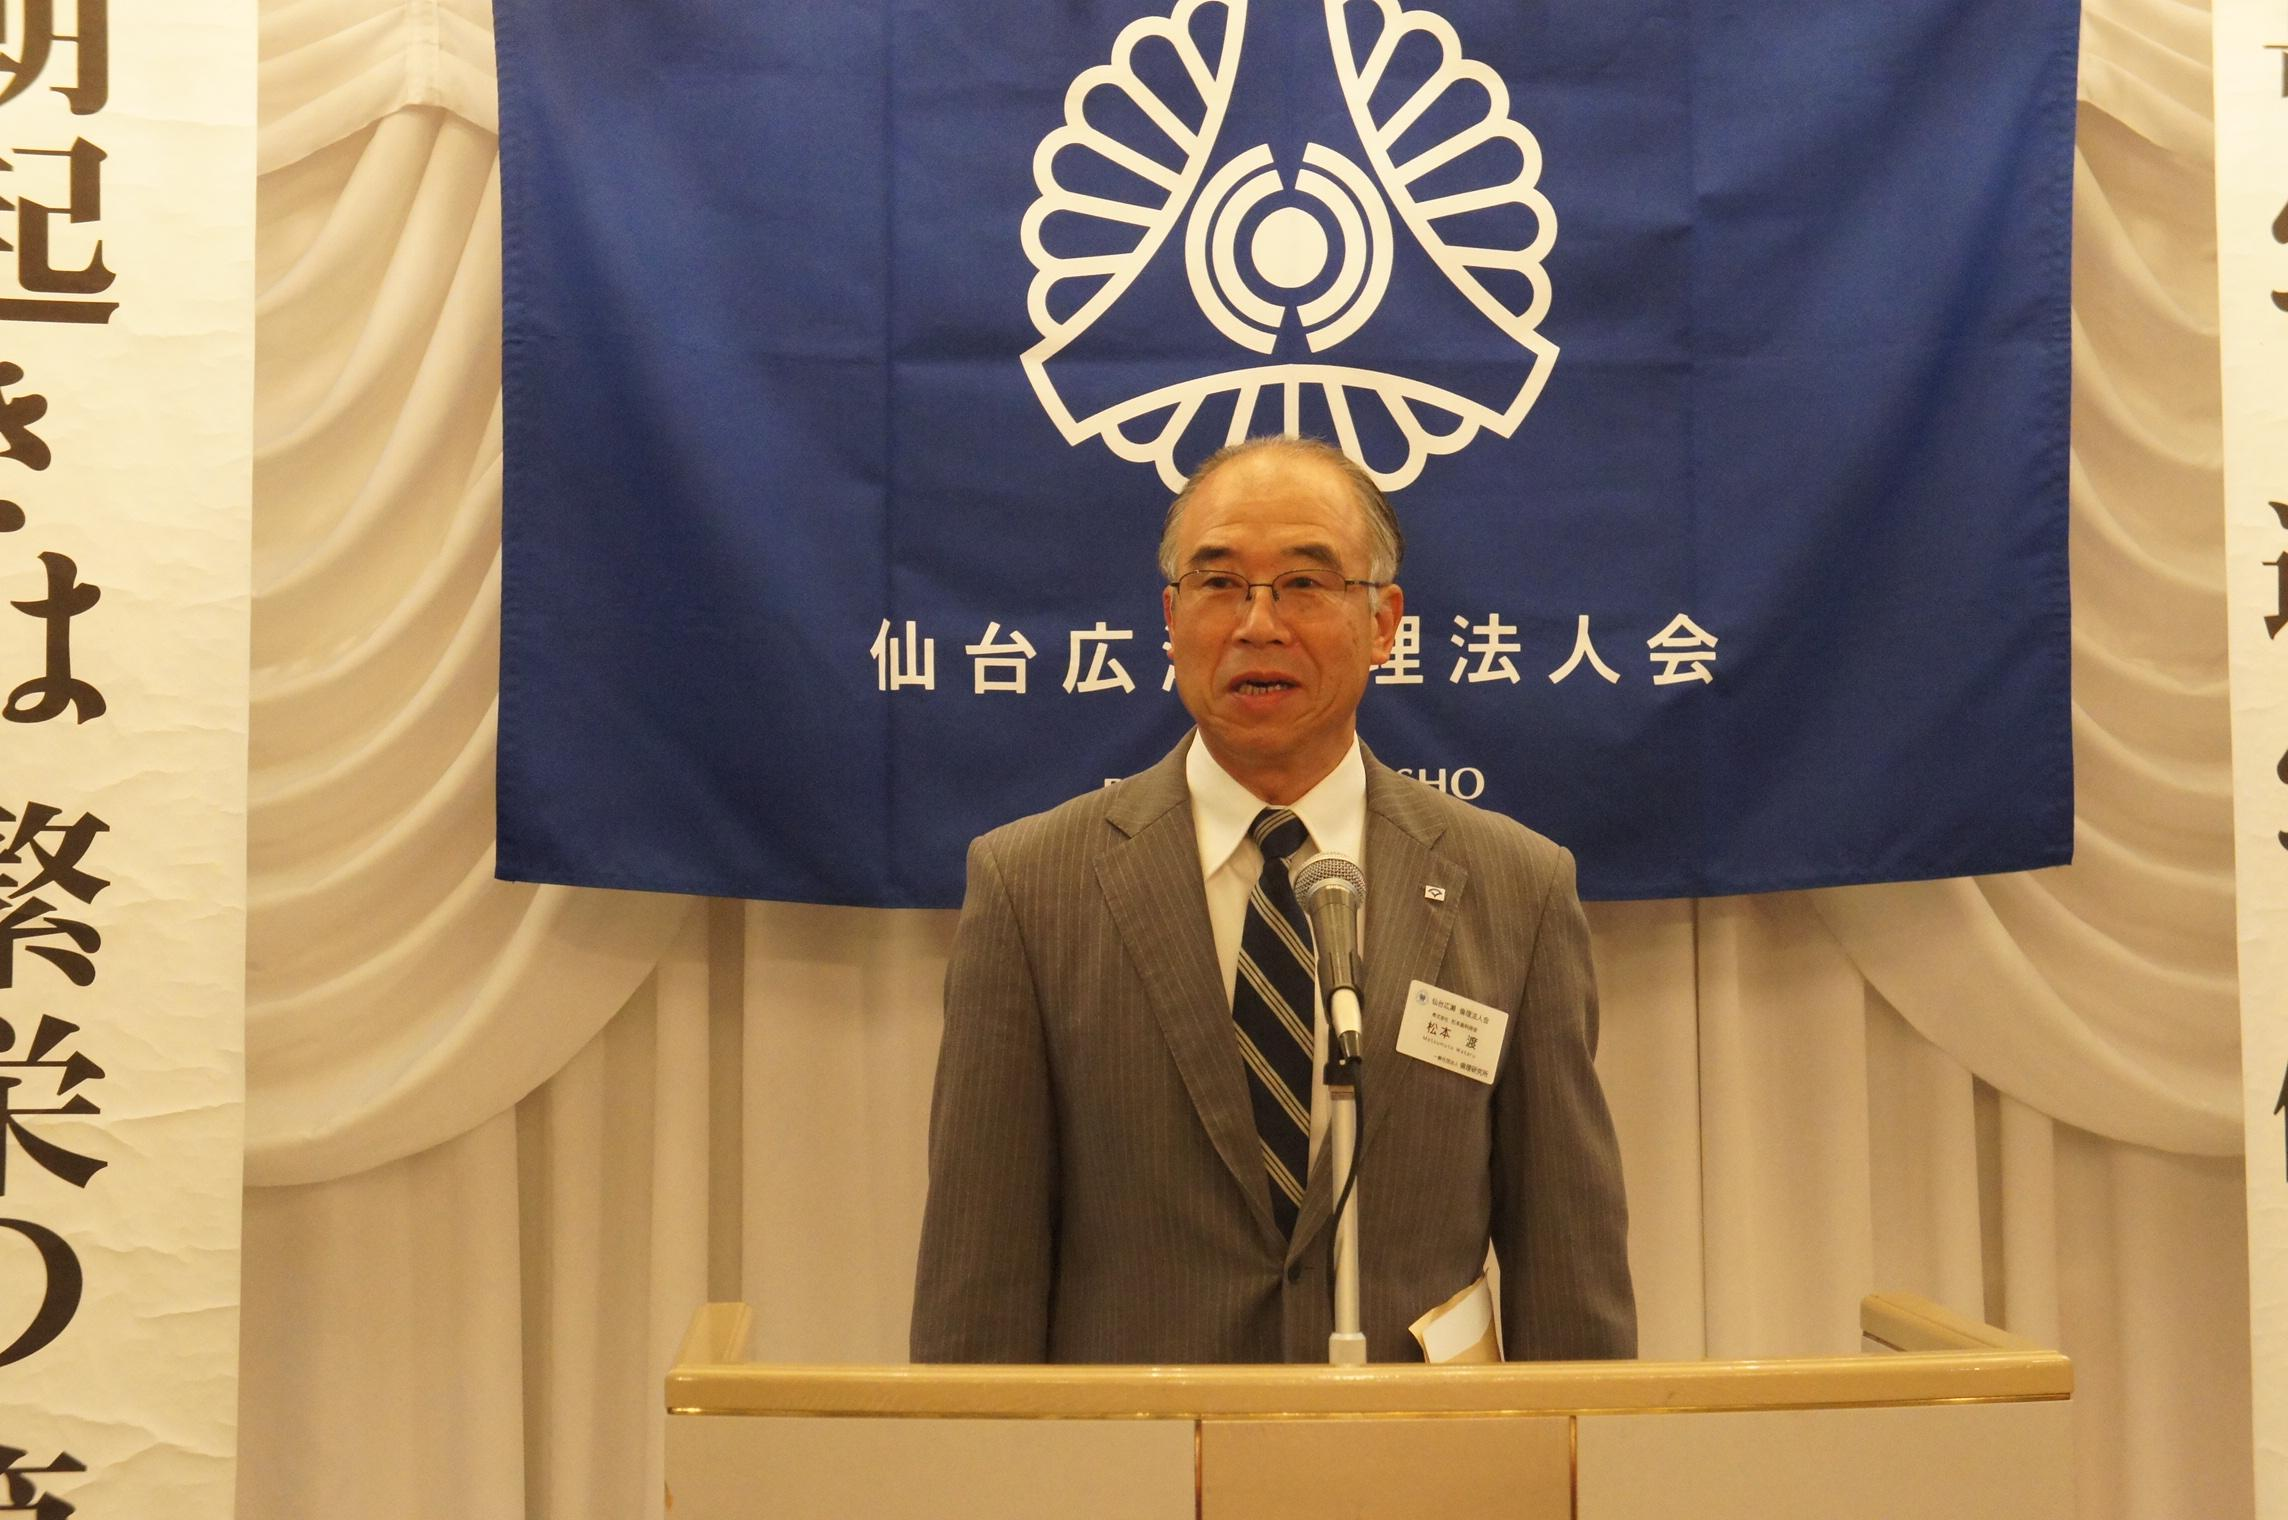 松本渡さん 新入会員 名札授与式